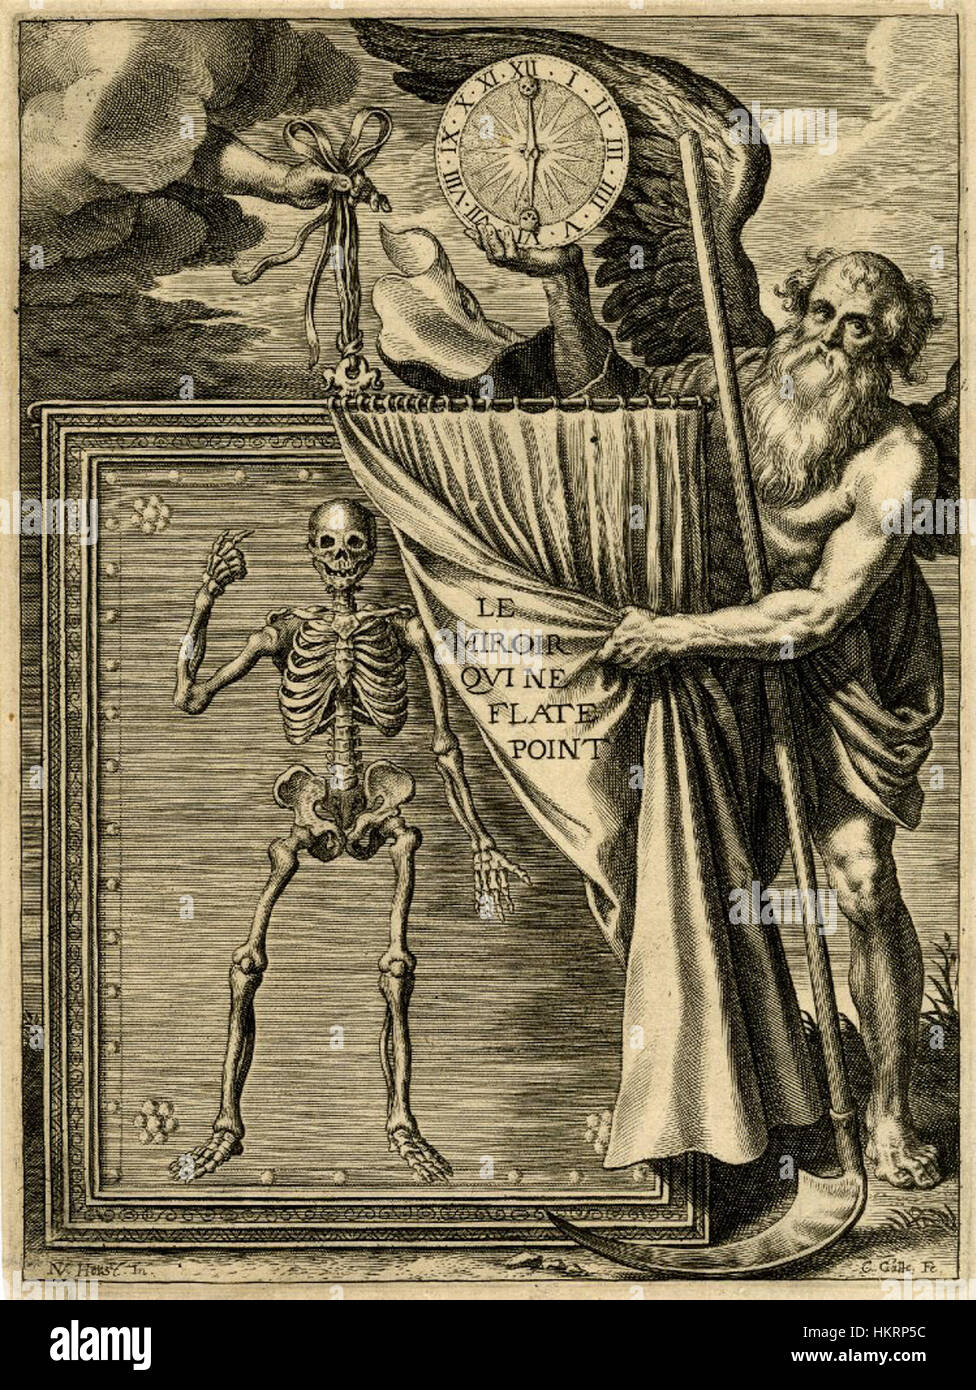 Cornelis Galle (I) and Nicolaas van der Horst - Frontispiece to Pierre Puget de la Serre's Le Miroir qui ne - Stock Image